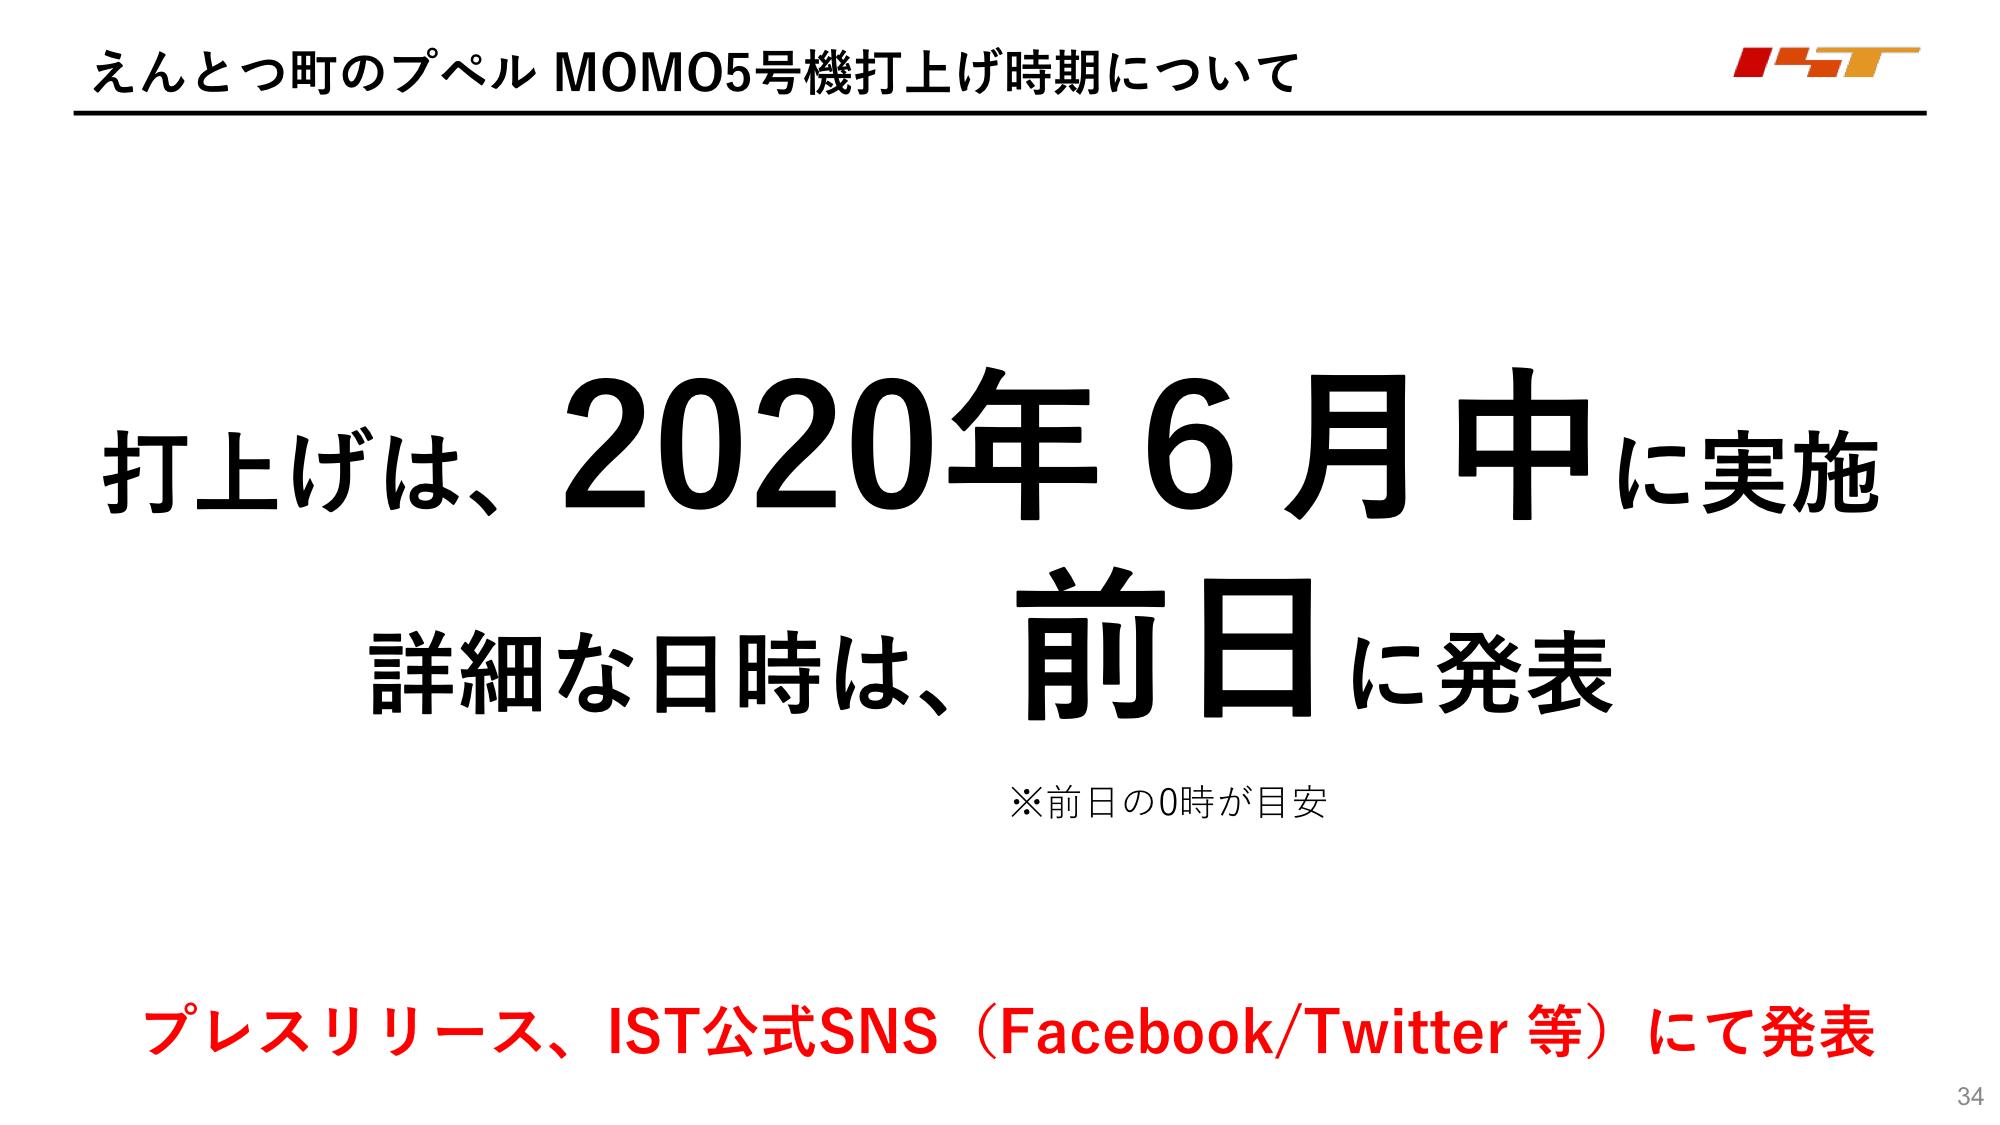 f:id:Imamura:20200603233032p:plain